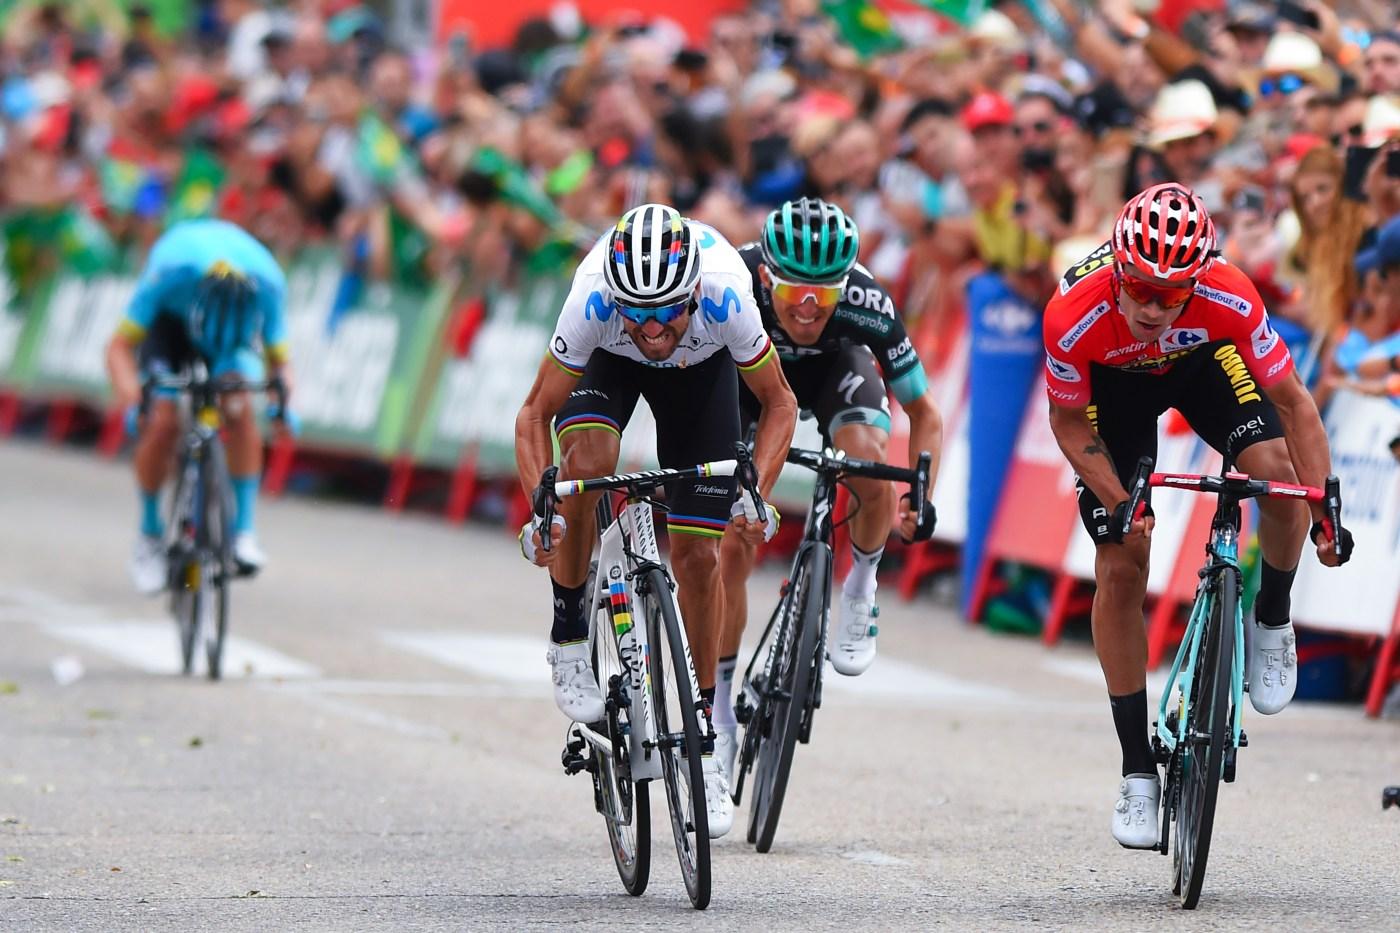 Vuelta Espana 2019